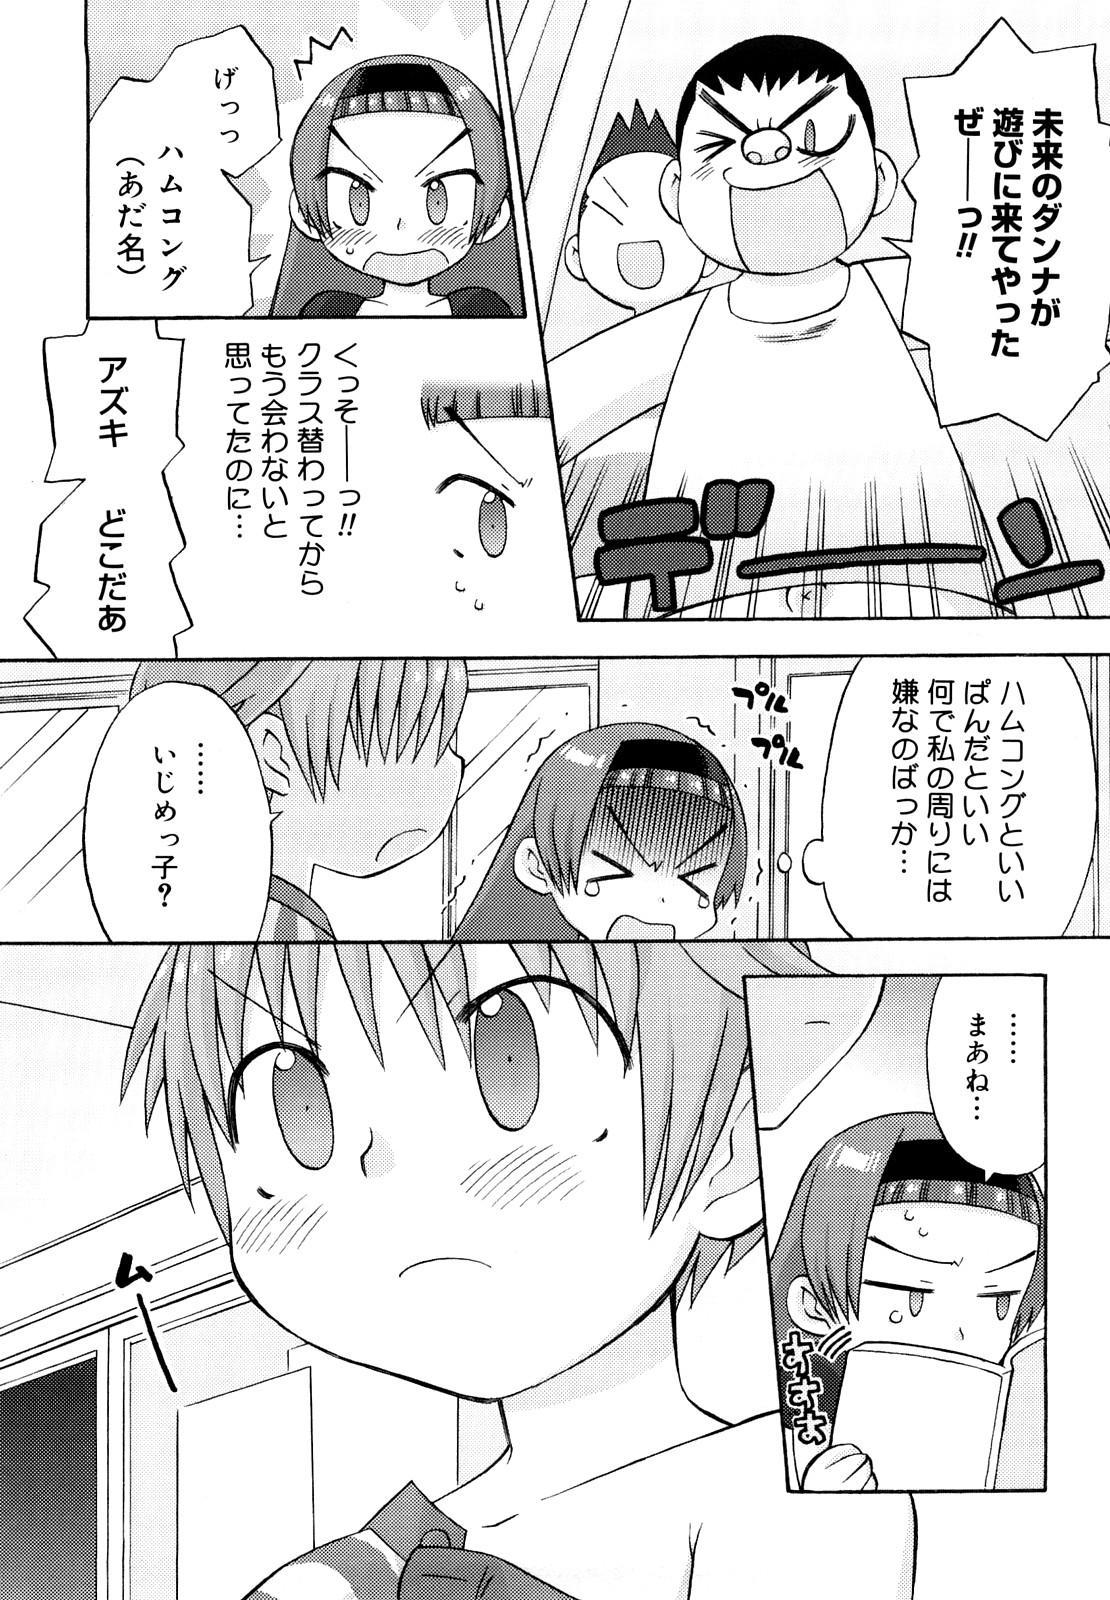 Hatsuden Pandakun! Shinsouban 22